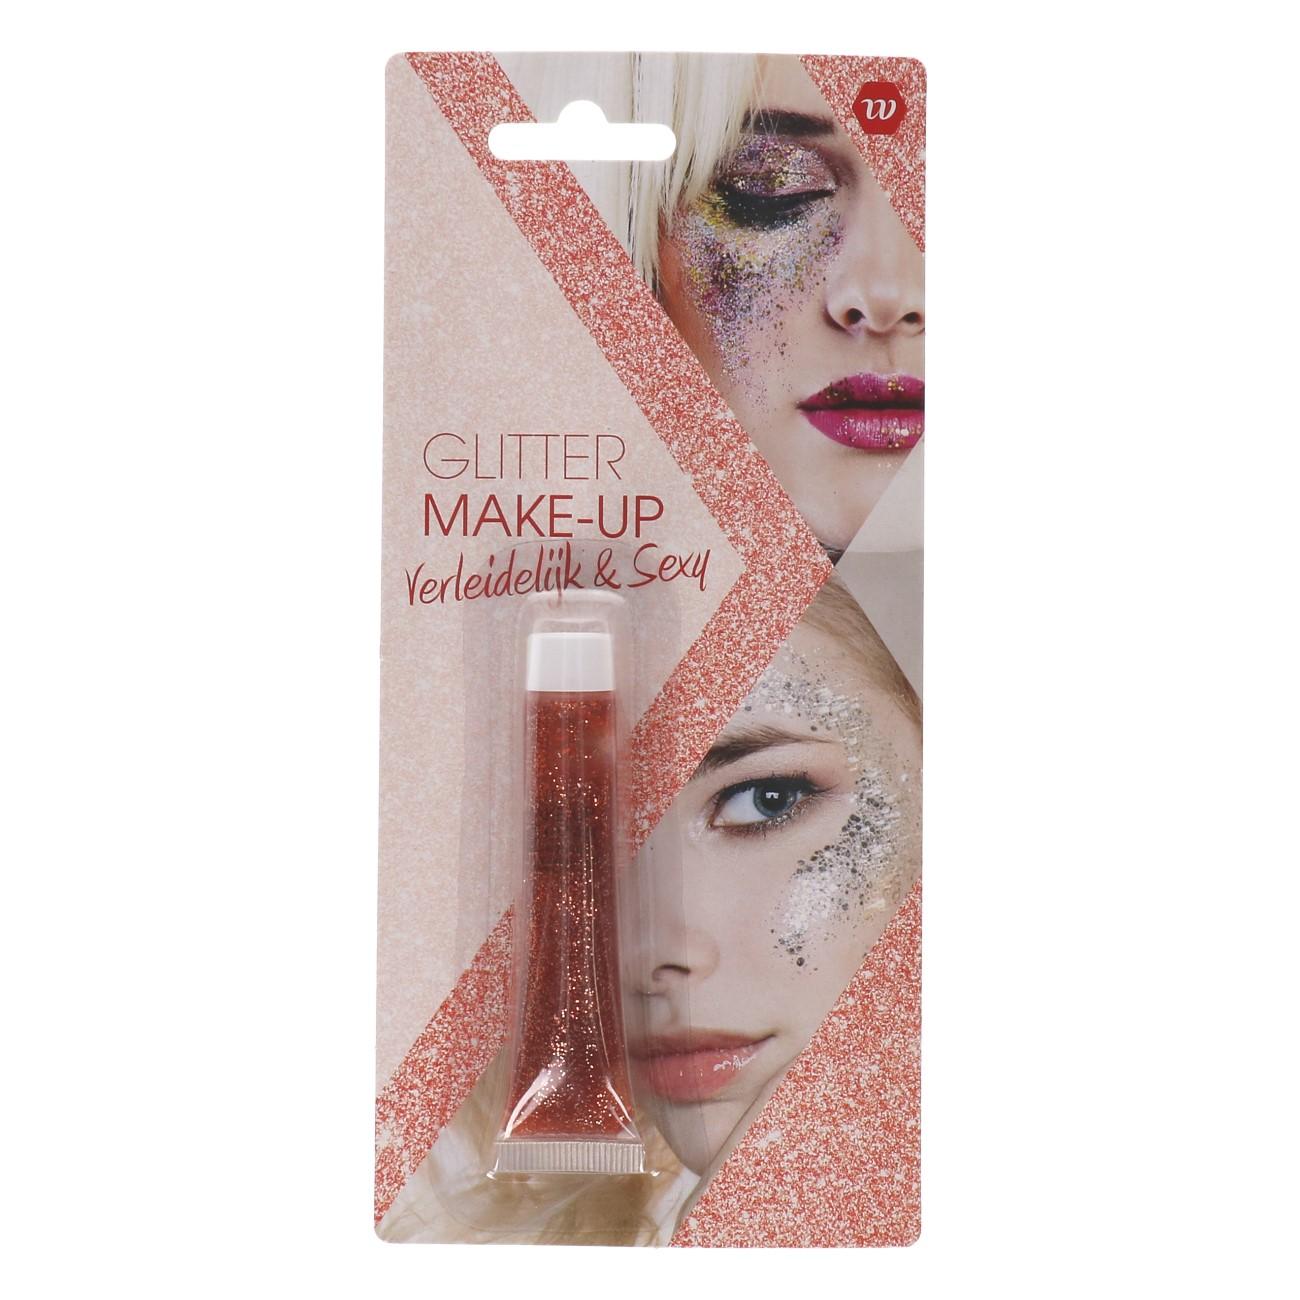 Glitter Make-up Verleidelijk & Sexy (Rood) 14gr